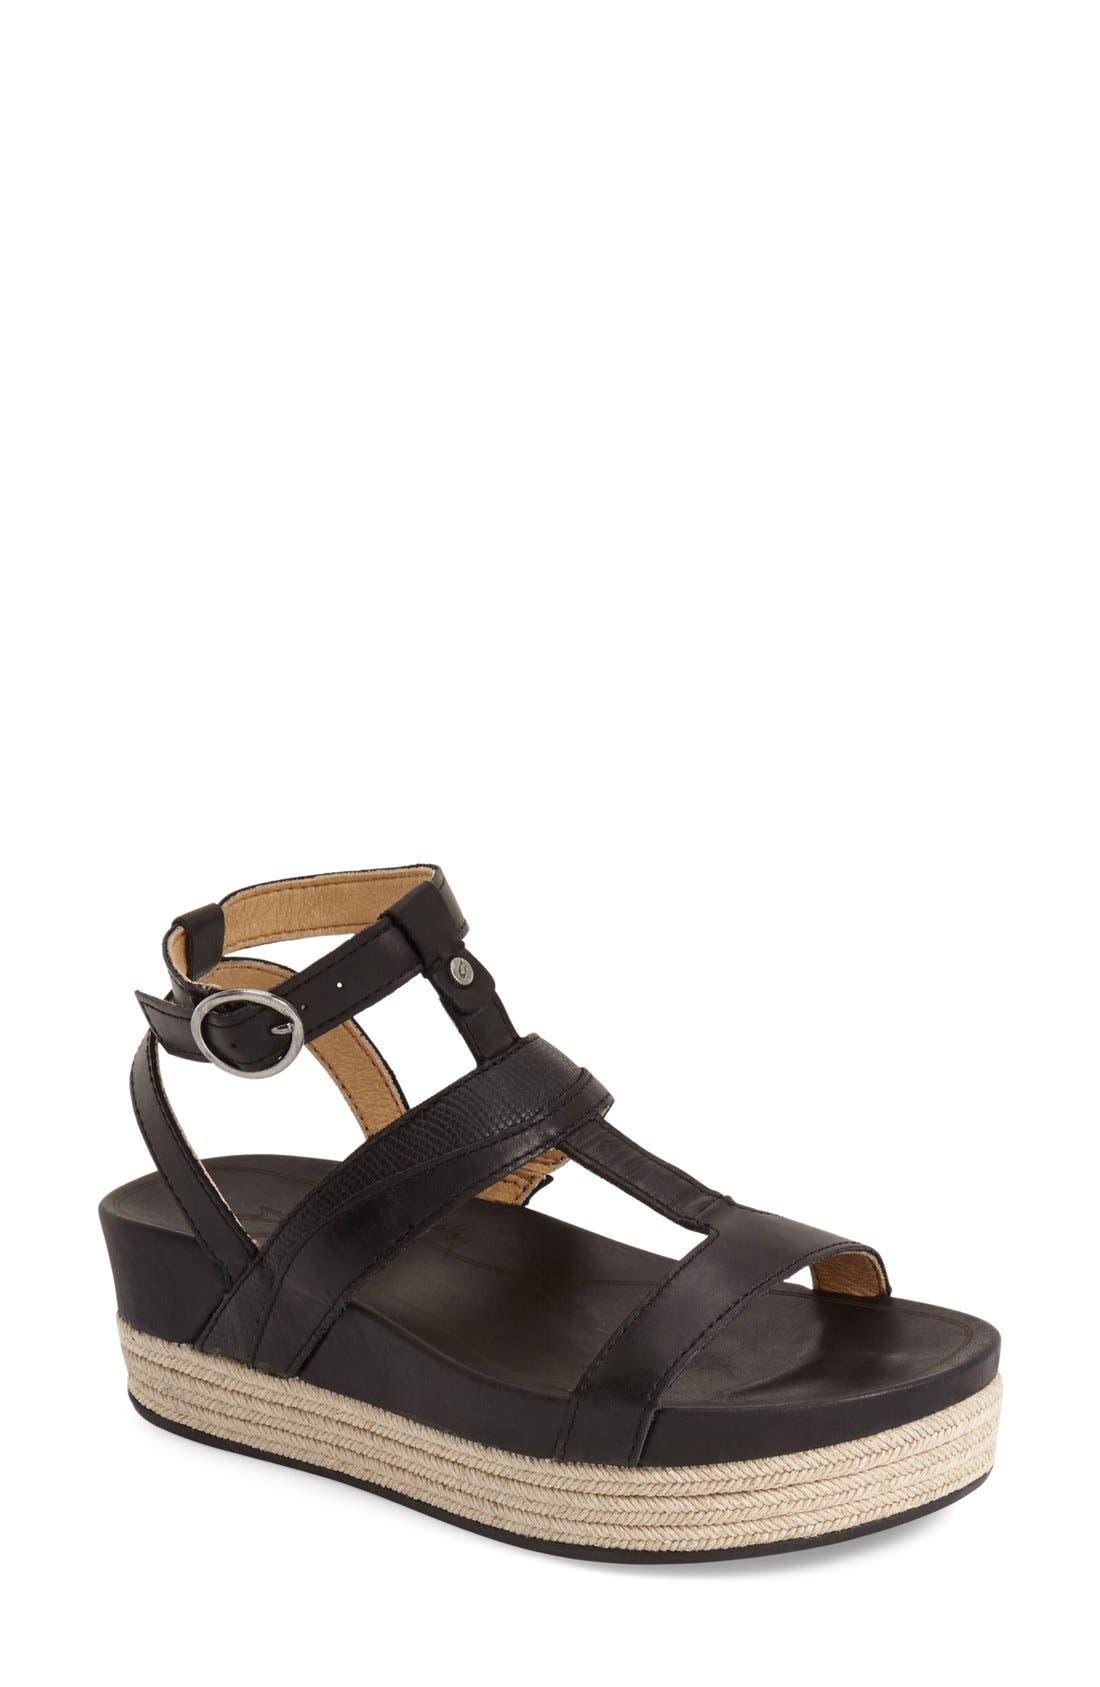 Main Image - OluKai 'Hi Ona Loa' Espadrille Platform Sandal (Women)